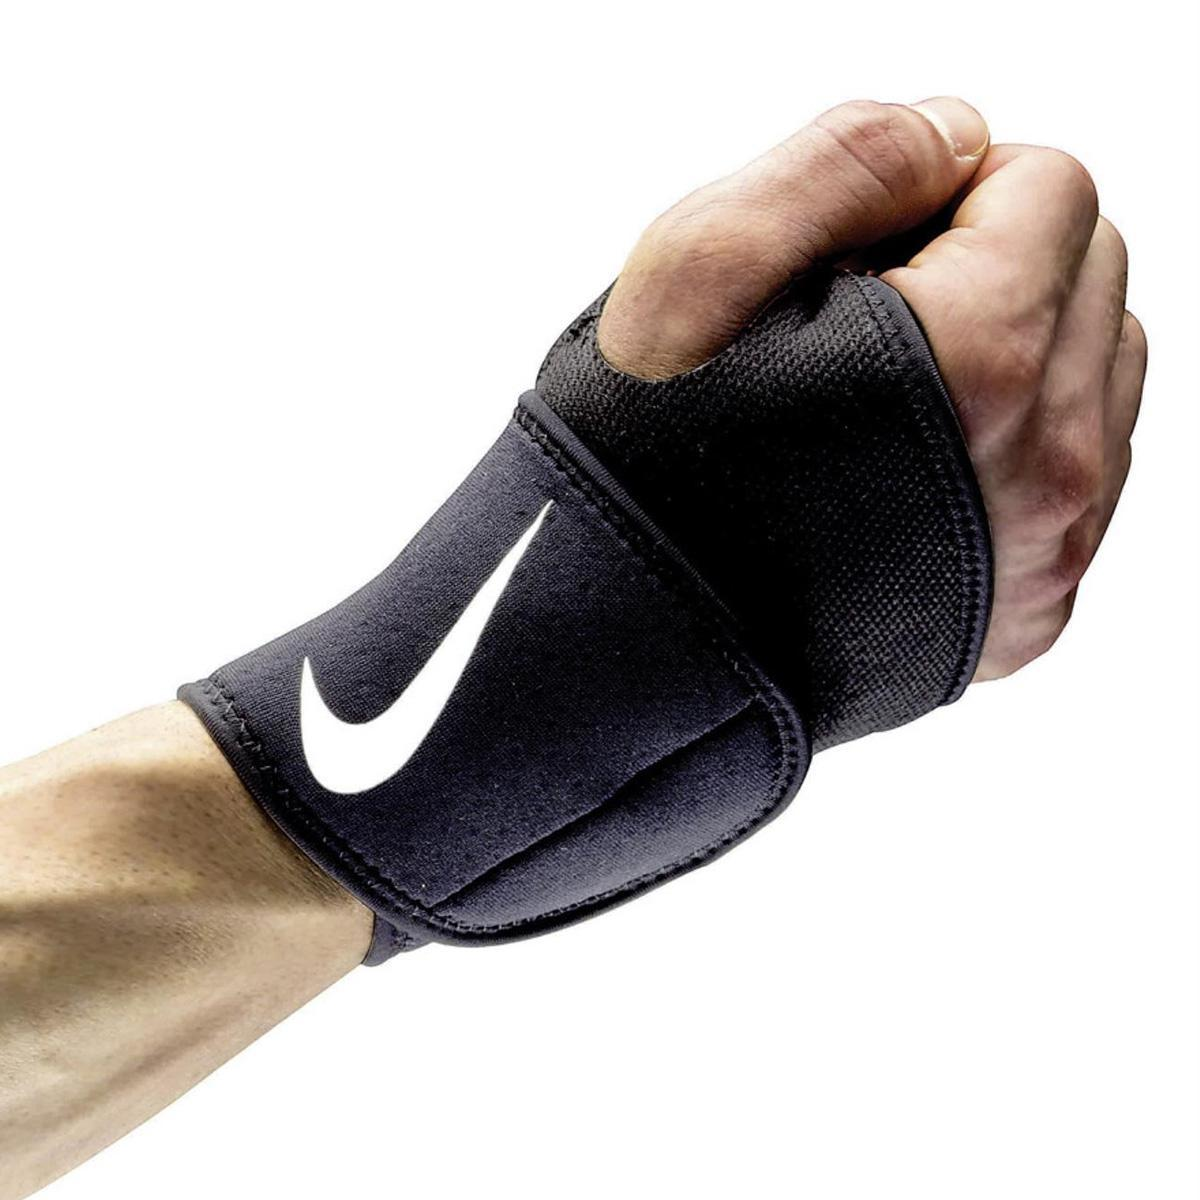 Hand Wrap Gloves Nike Pro Combat Wrist And Thumb Wrap 20 Tennisnutscom